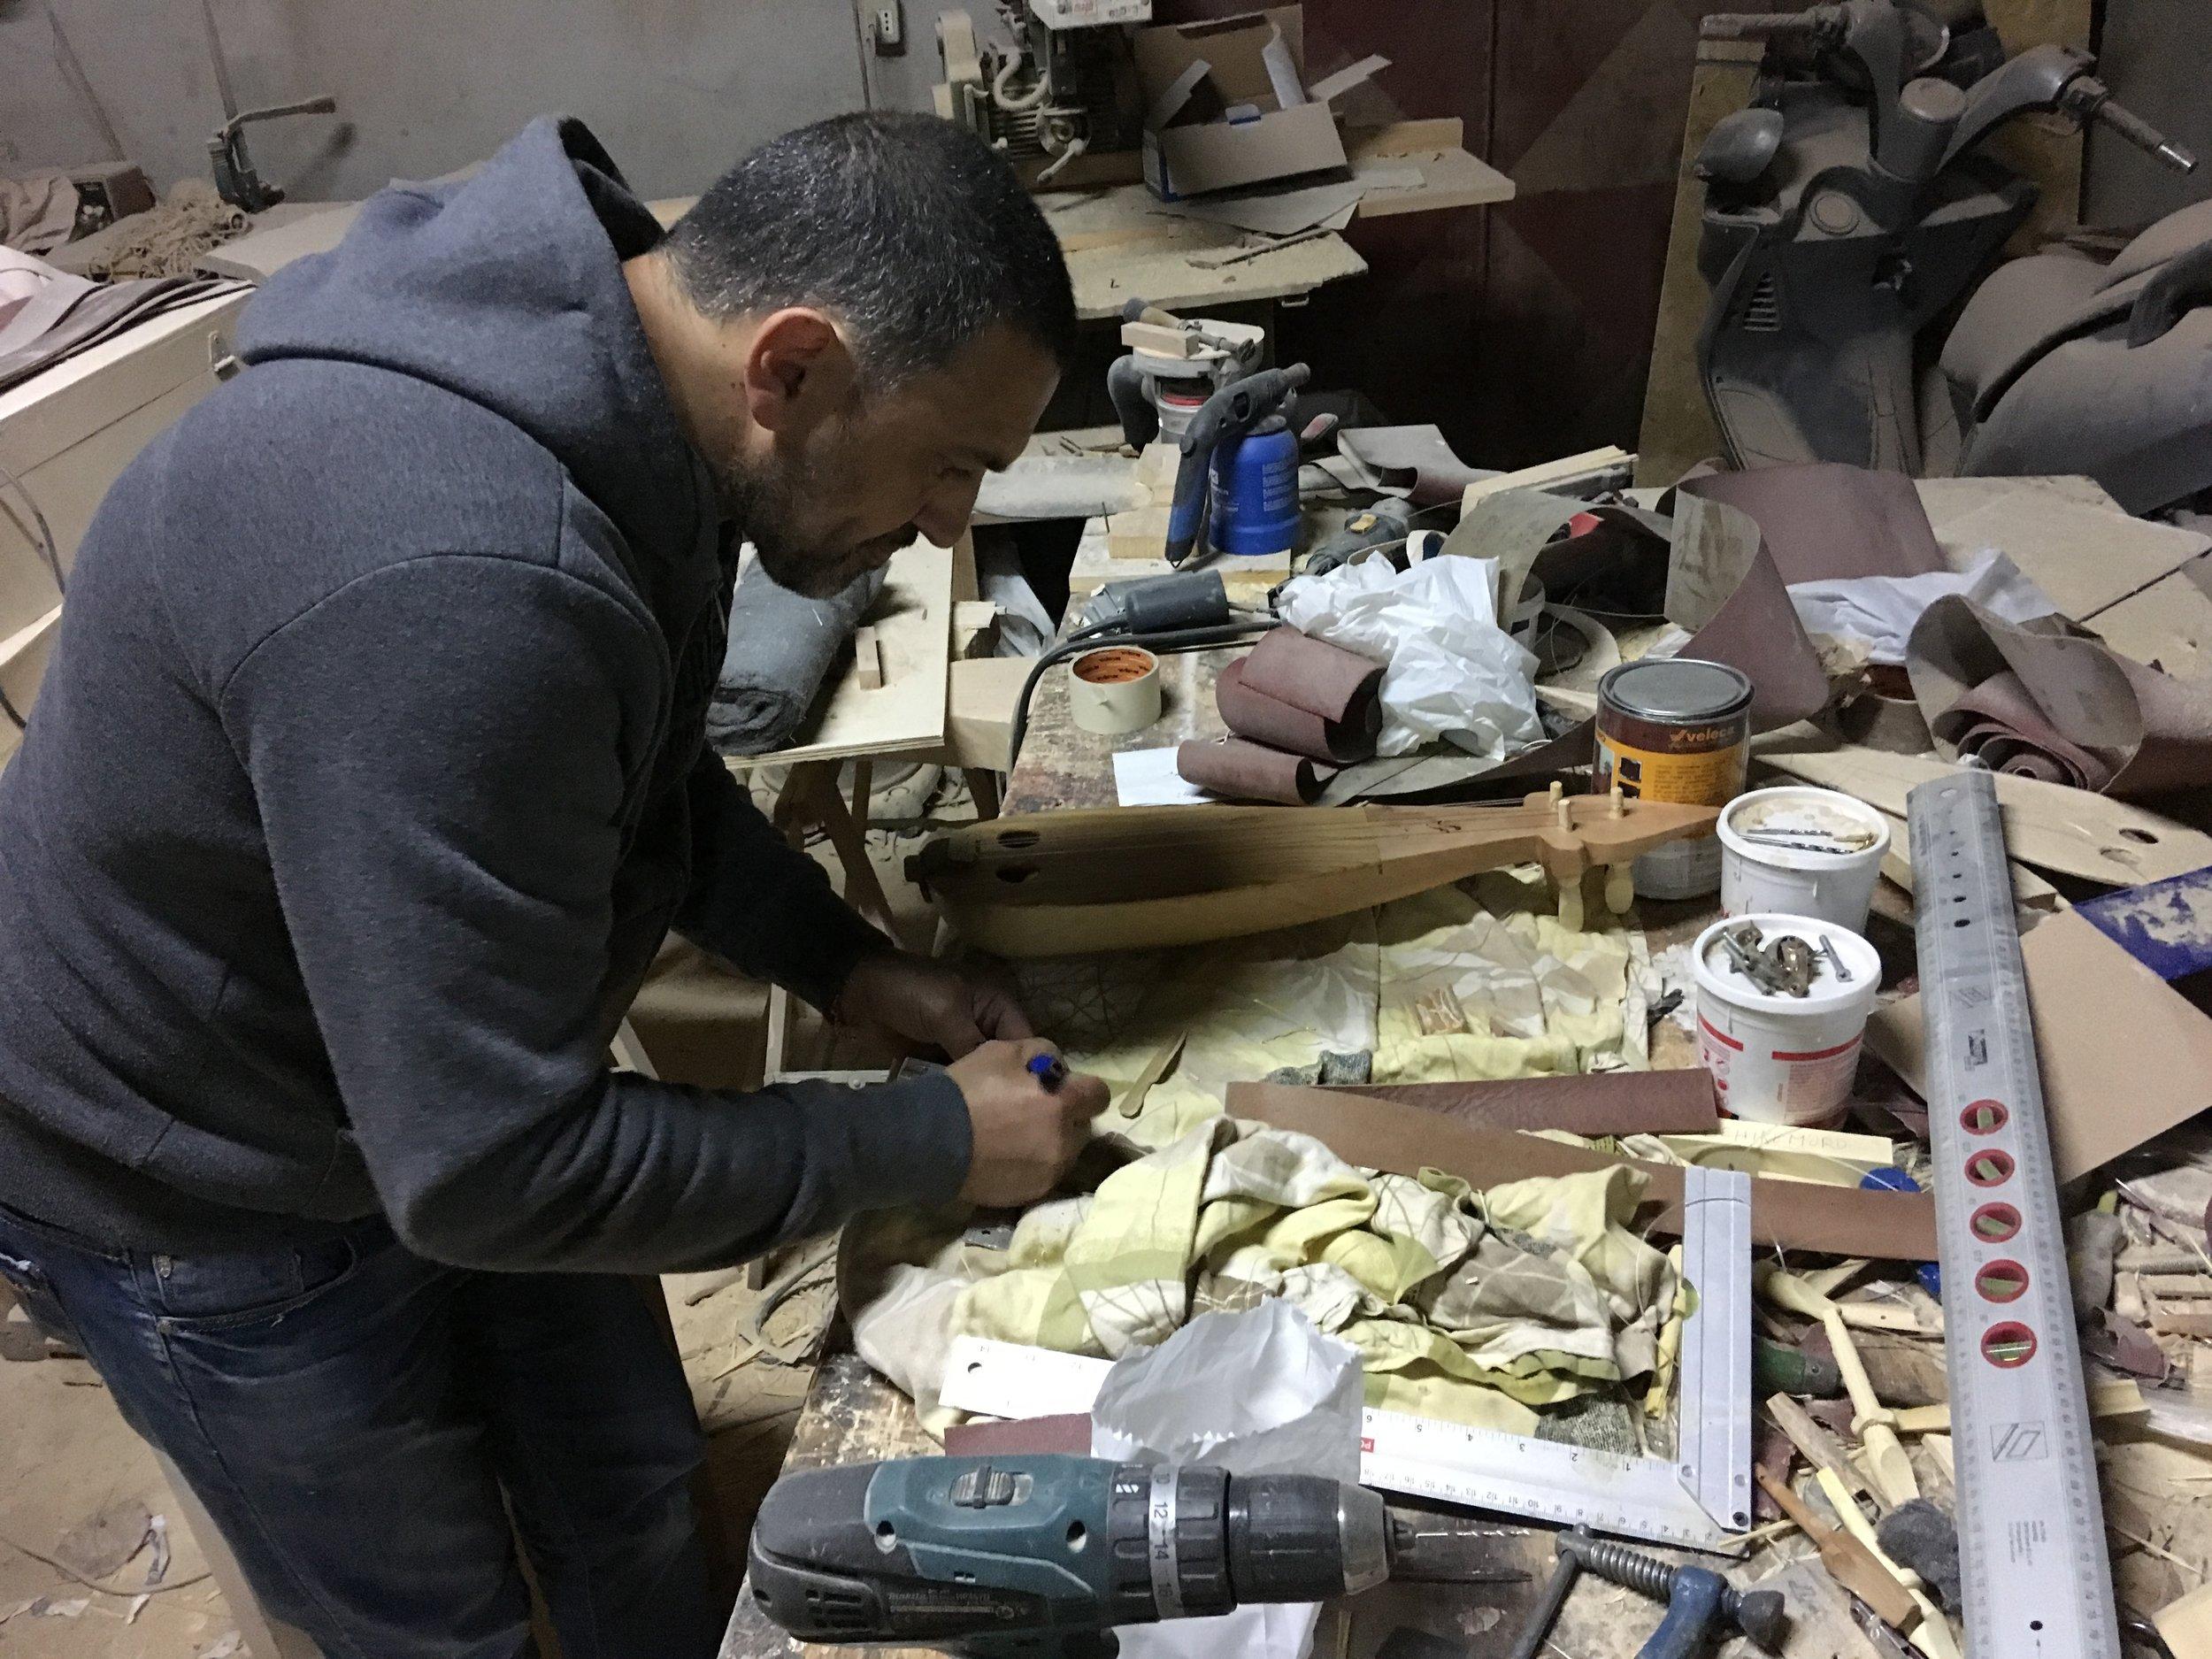 Francesco Siviglia in his laboratory, Bova Marina, Calabria, Italy